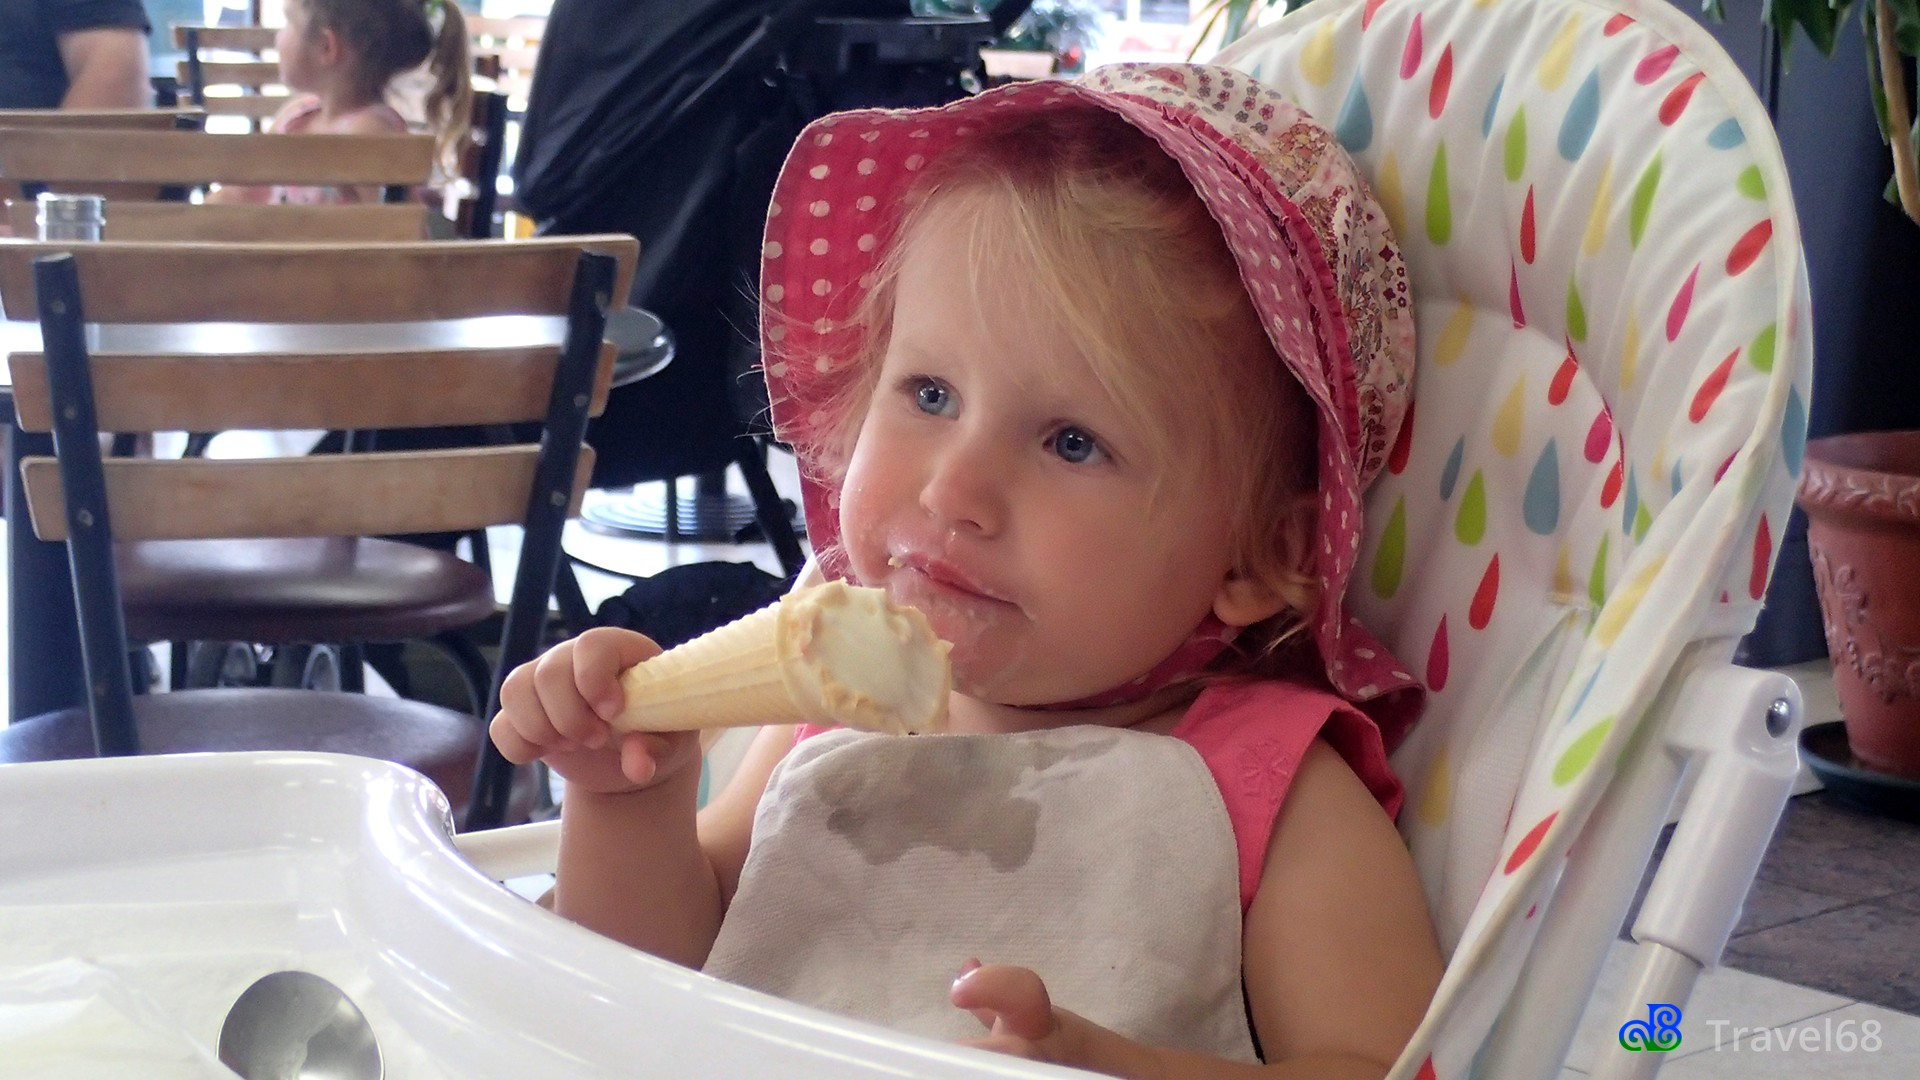 I eet een ijsje